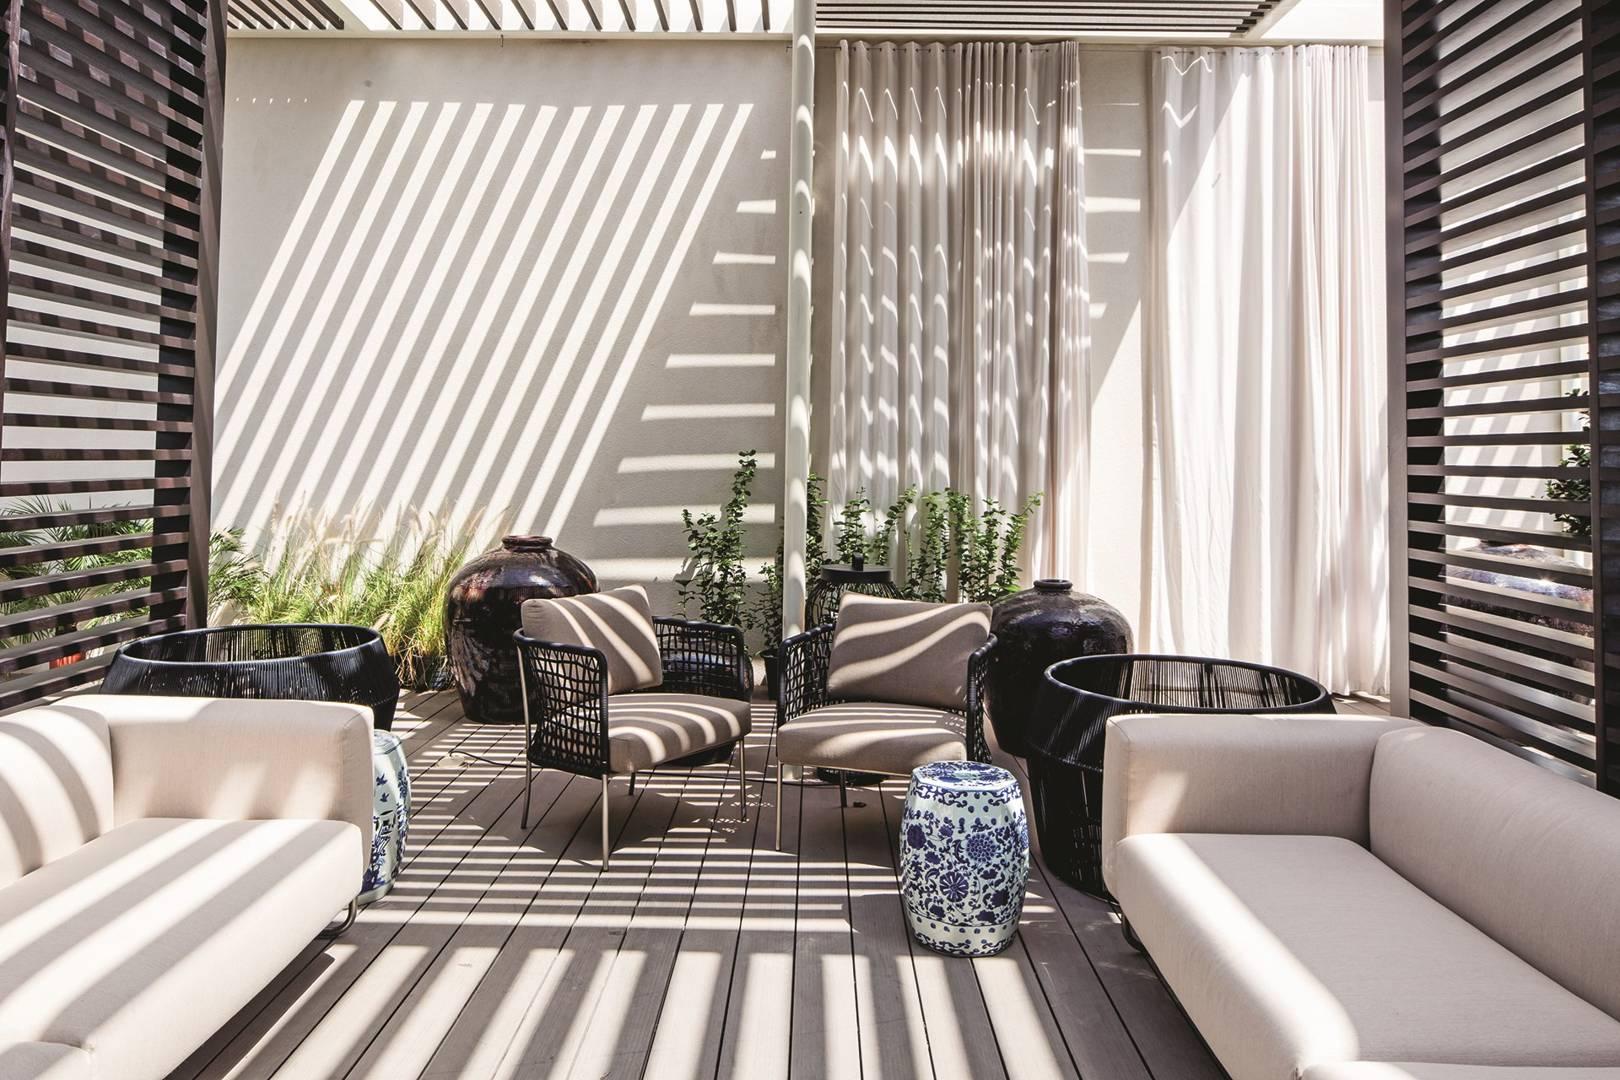 Furniture Fine Simple Modern Modern Hotel Fashion Coffee Shop Metal Lounge Chair Villa Bibden Sofa Childrens Stool